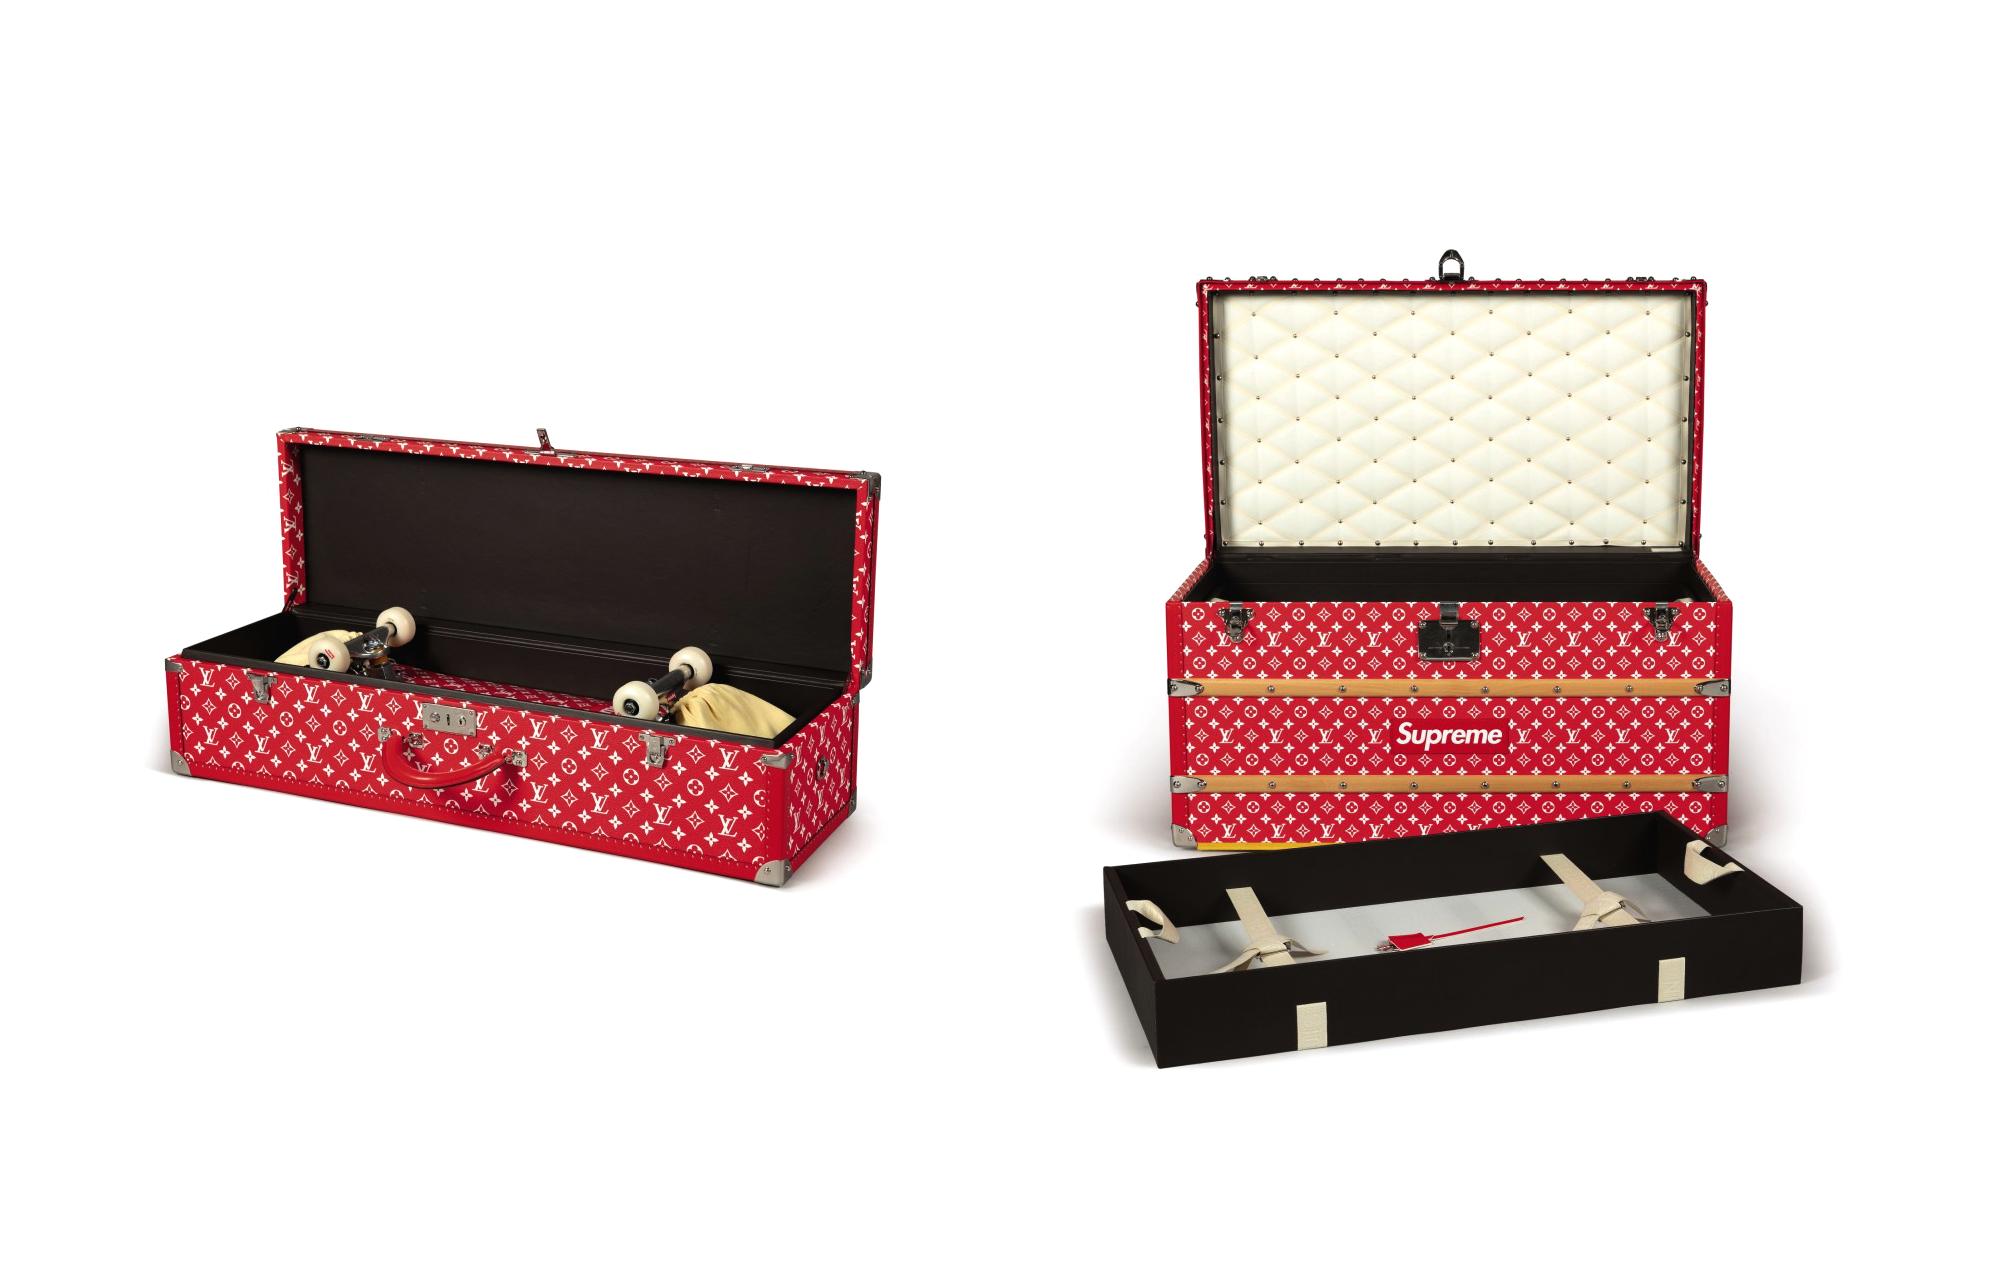 Чемоданы Louis Vuitton x Supreme - хип-хоп-аукцион Sotheby's